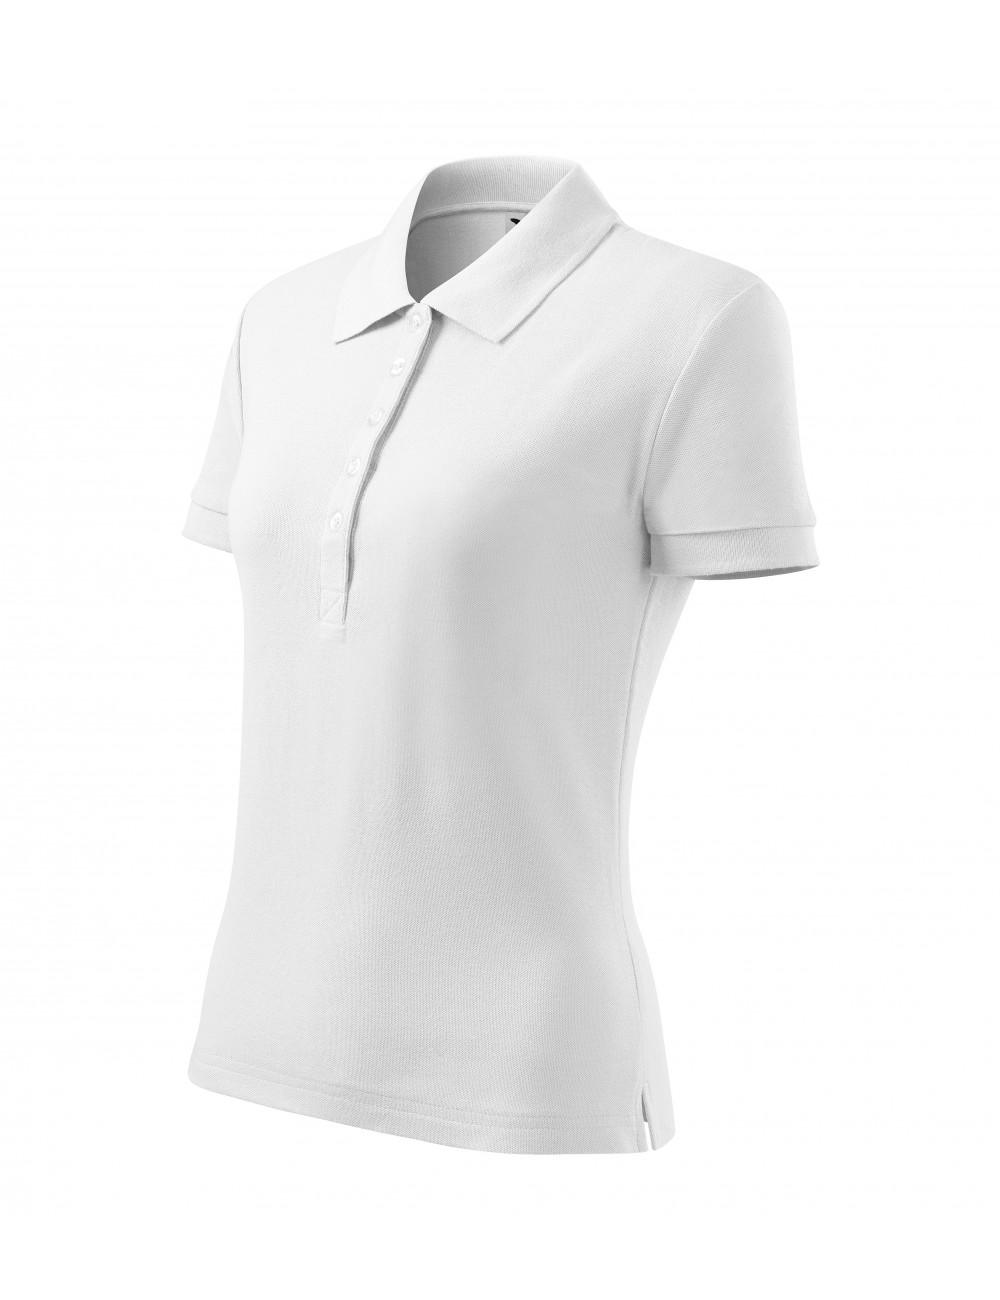 Adler MALFINI Koszulka polo damska Cotton Heavy 216 biały